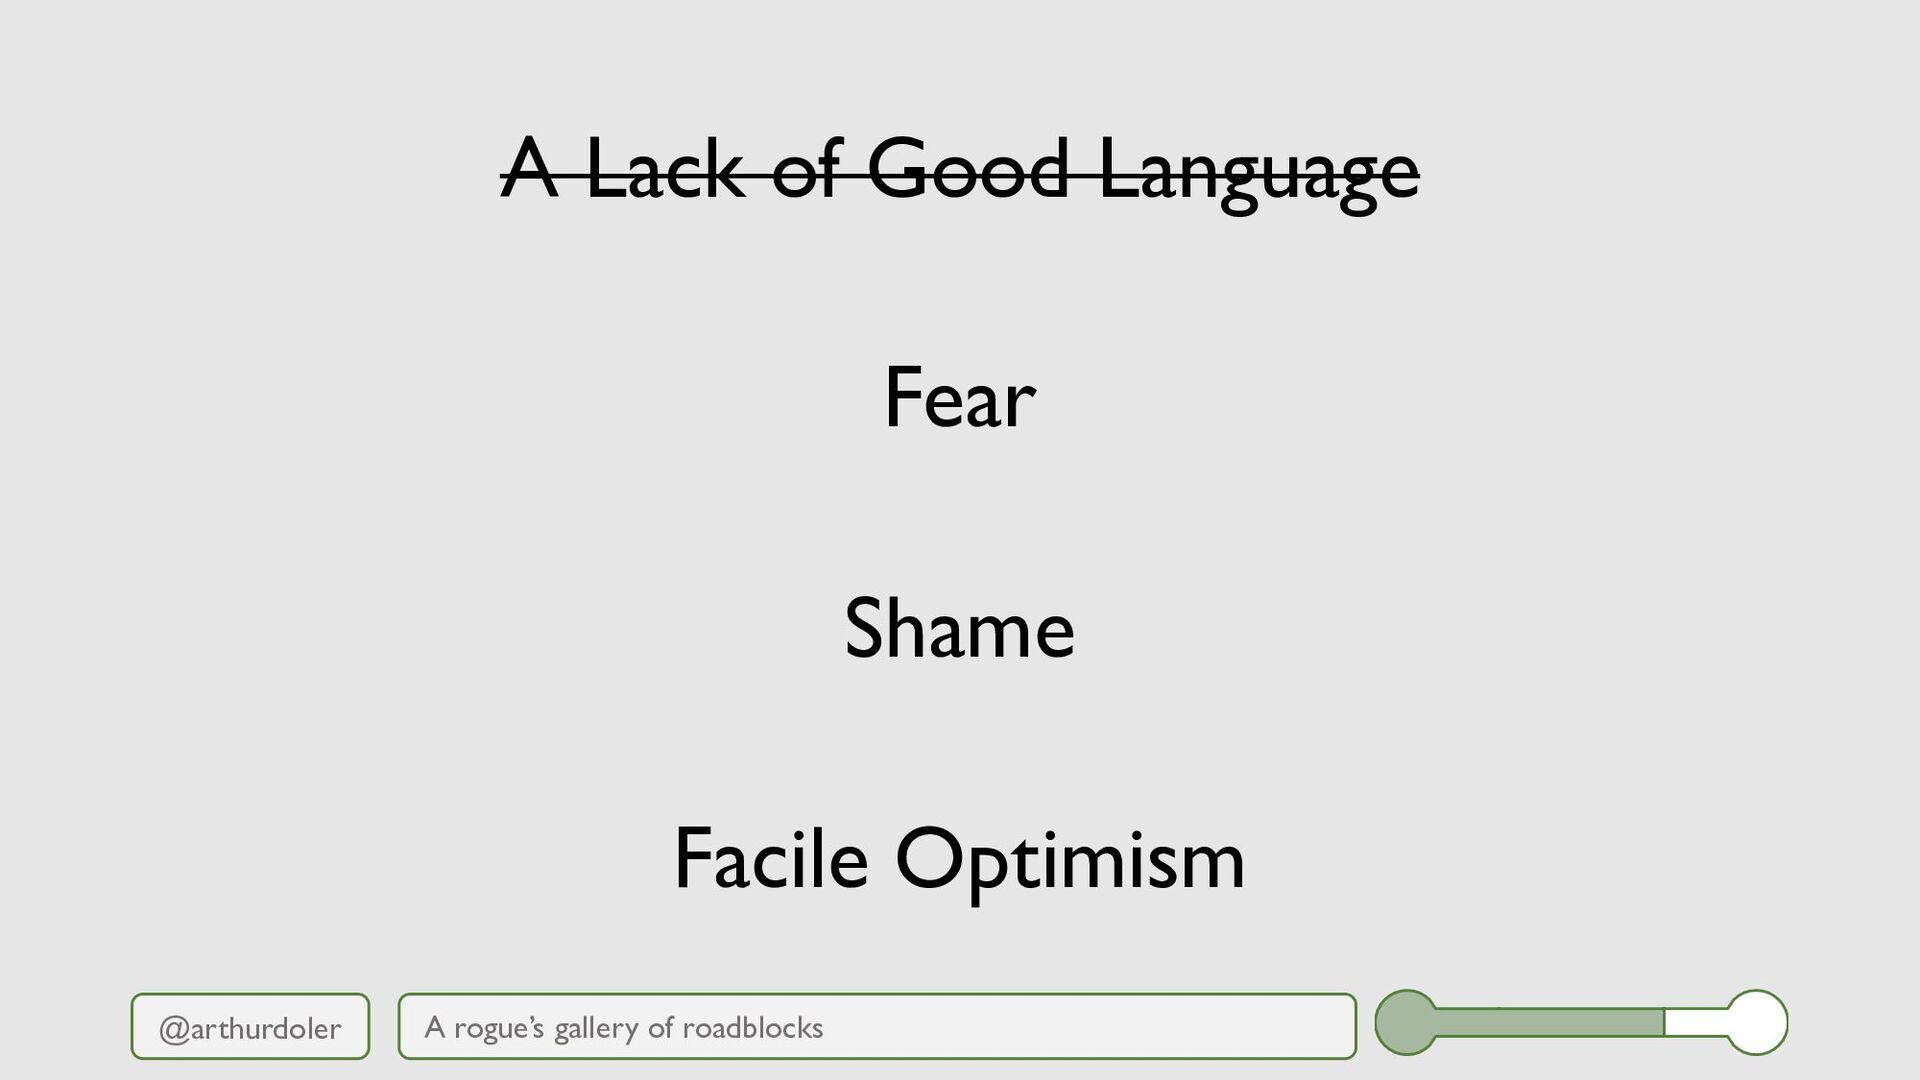 @arthurdoler A Lack of Good Language Fear Shame...